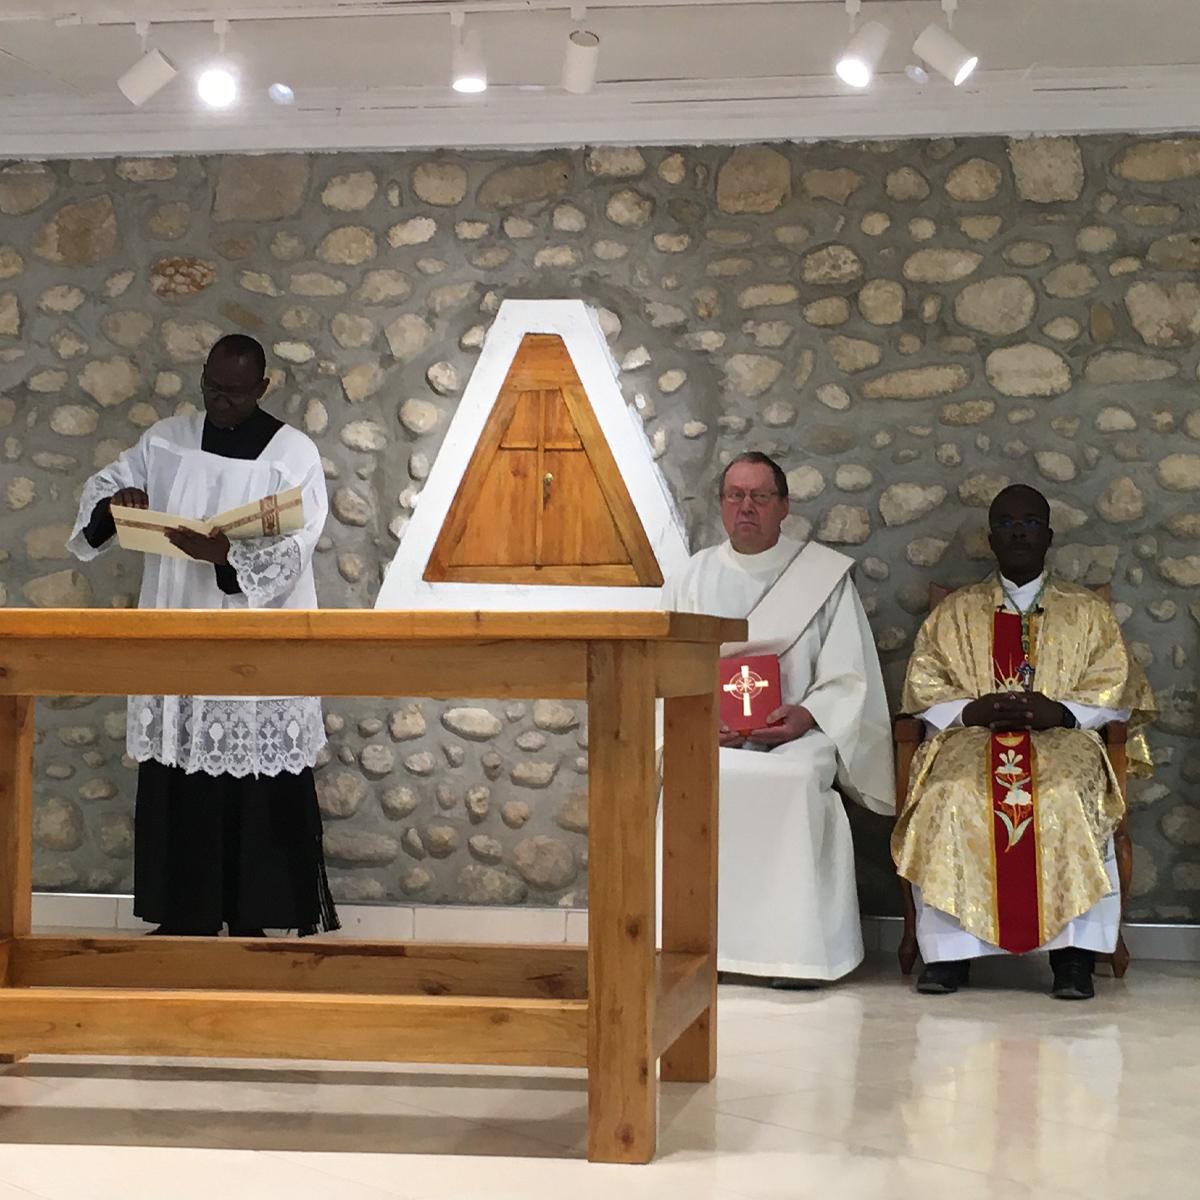 scene from catholic mass